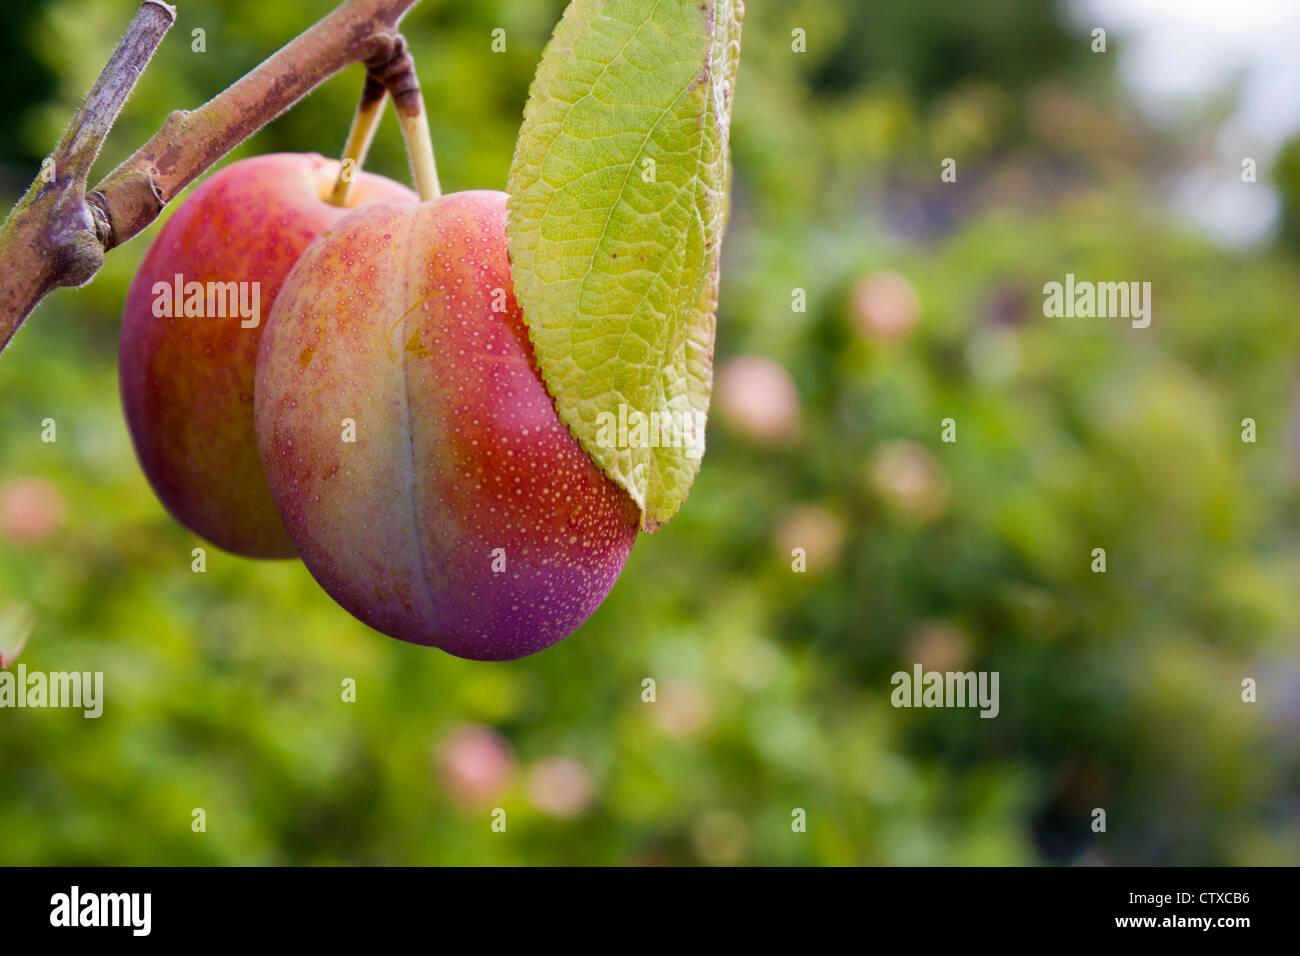 Victoria plums fruit tree. - Stock Image